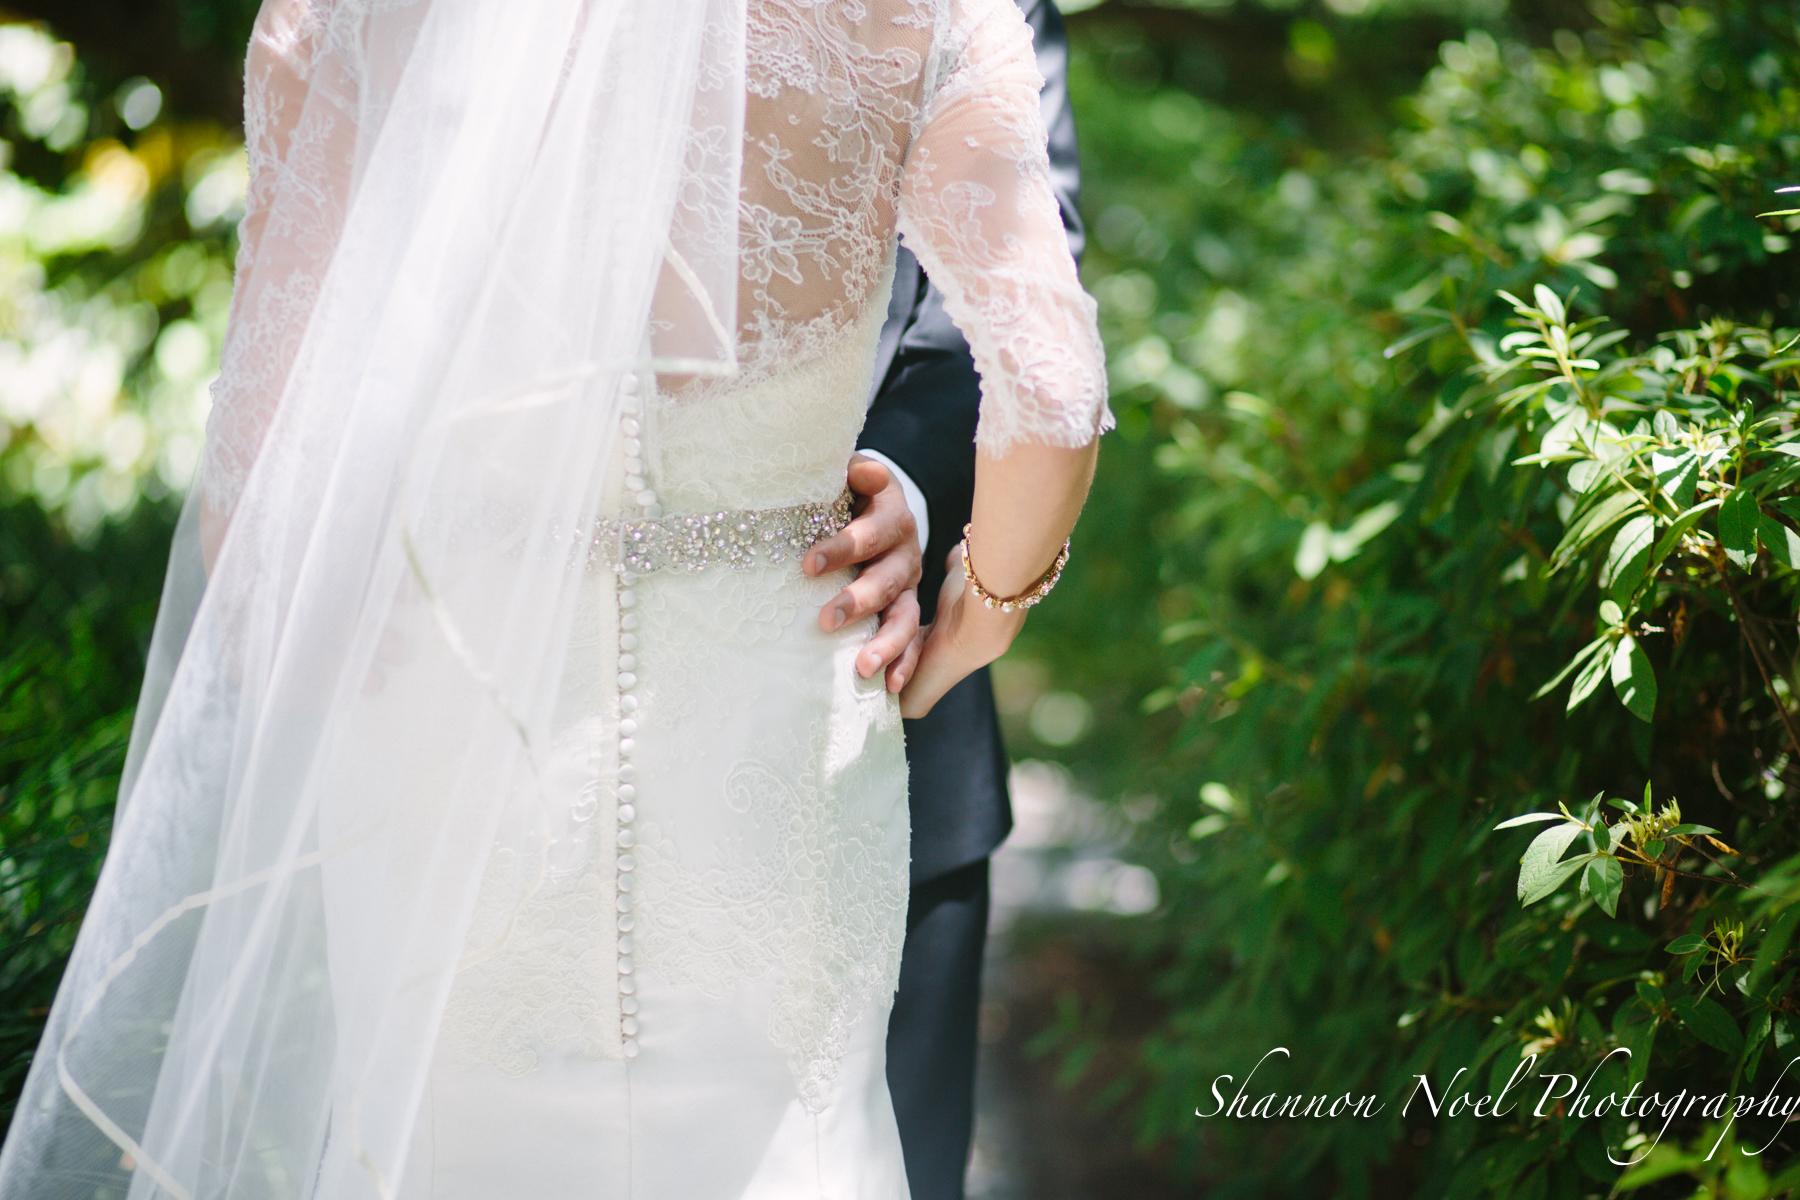 Shannon Noel Photography